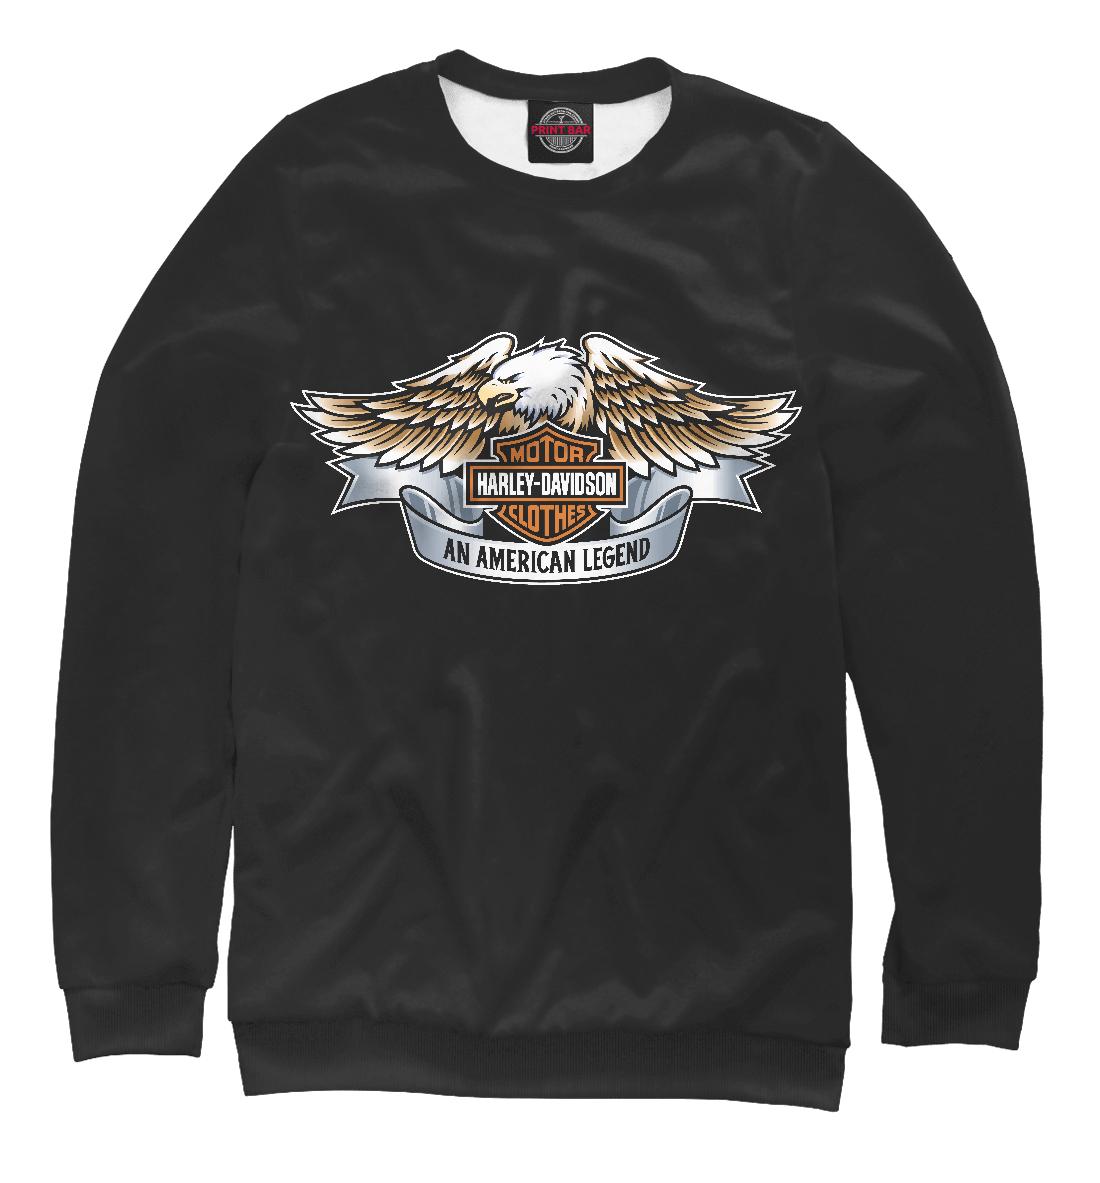 Купить Harley-Davidson An American Legend, Printbar, Свитшоты, HRD-165932-swi-1